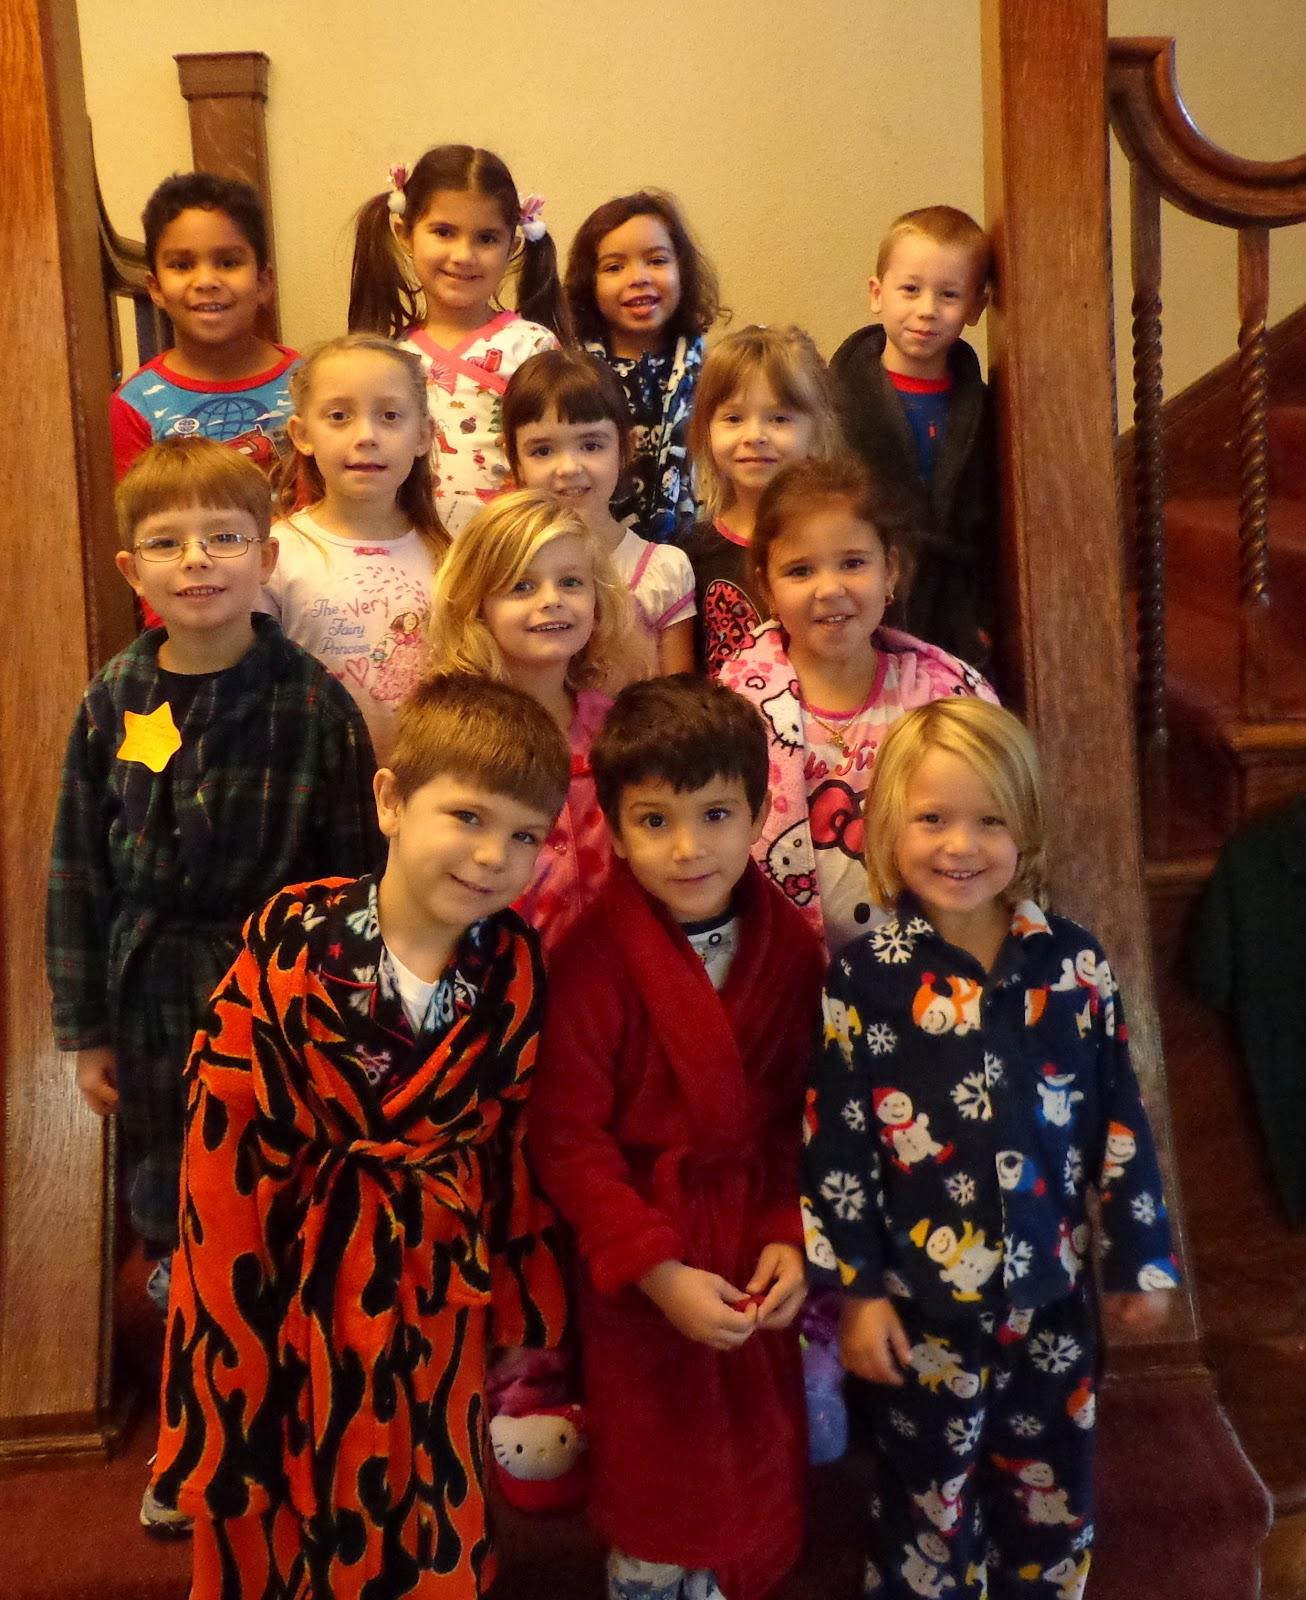 DSC00163 - Kindergarten Picture Day